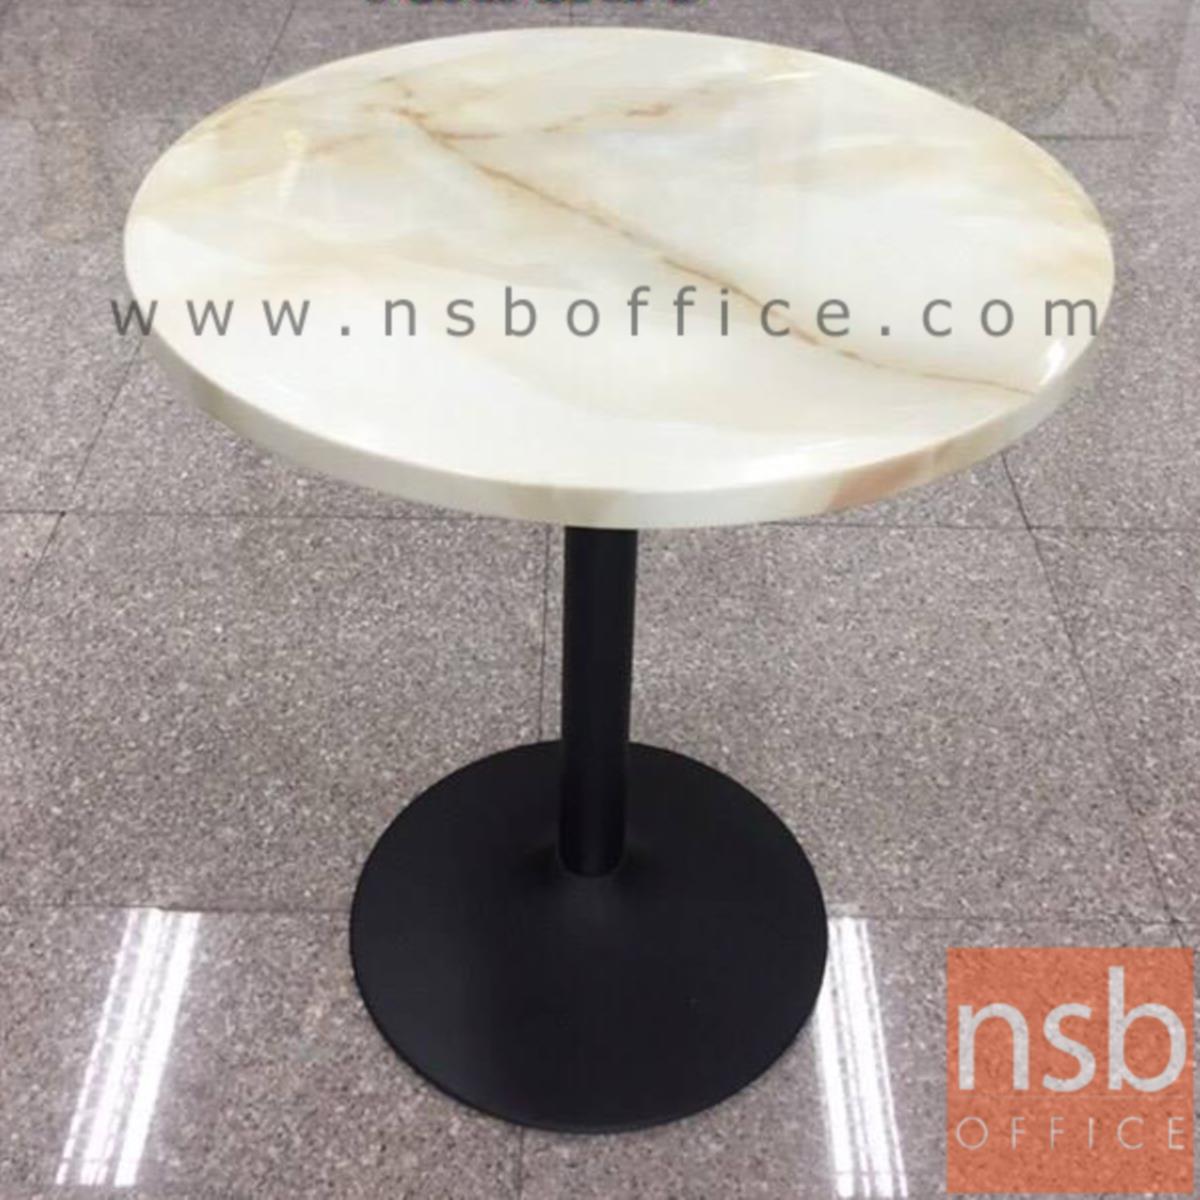 A14A204:โต๊ะหน้าหินอ่อน รุ่น Beckinsale (เบ็กคินเซล) ขนาด 60W ,60Di cm.  โครงเหล็กเคลือบสีดำ